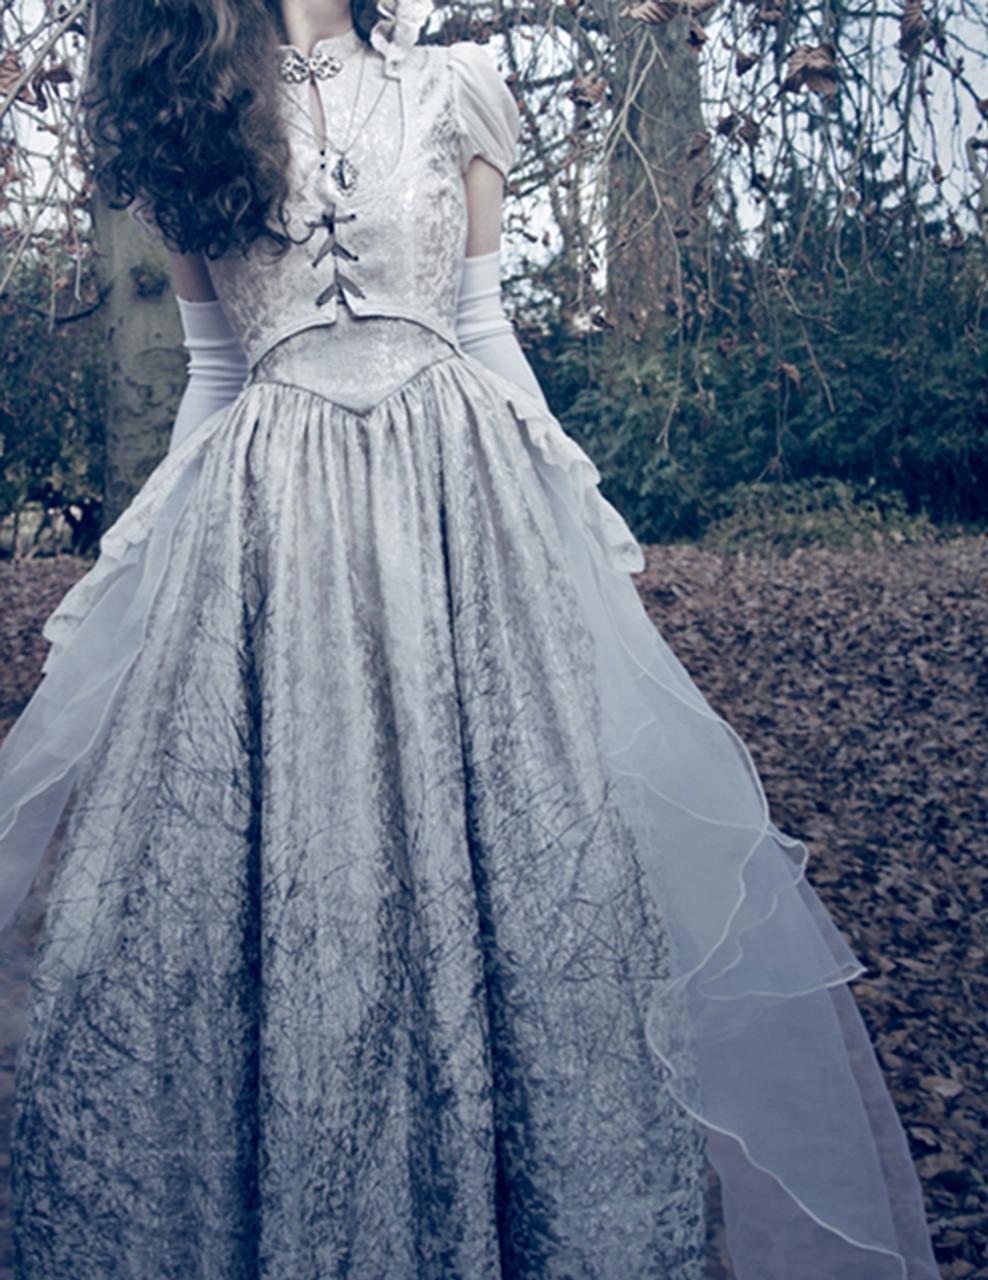 Fairy Halter Neck Dress Sleeveless Dress Maxi Dress Petticoat Skirt ...